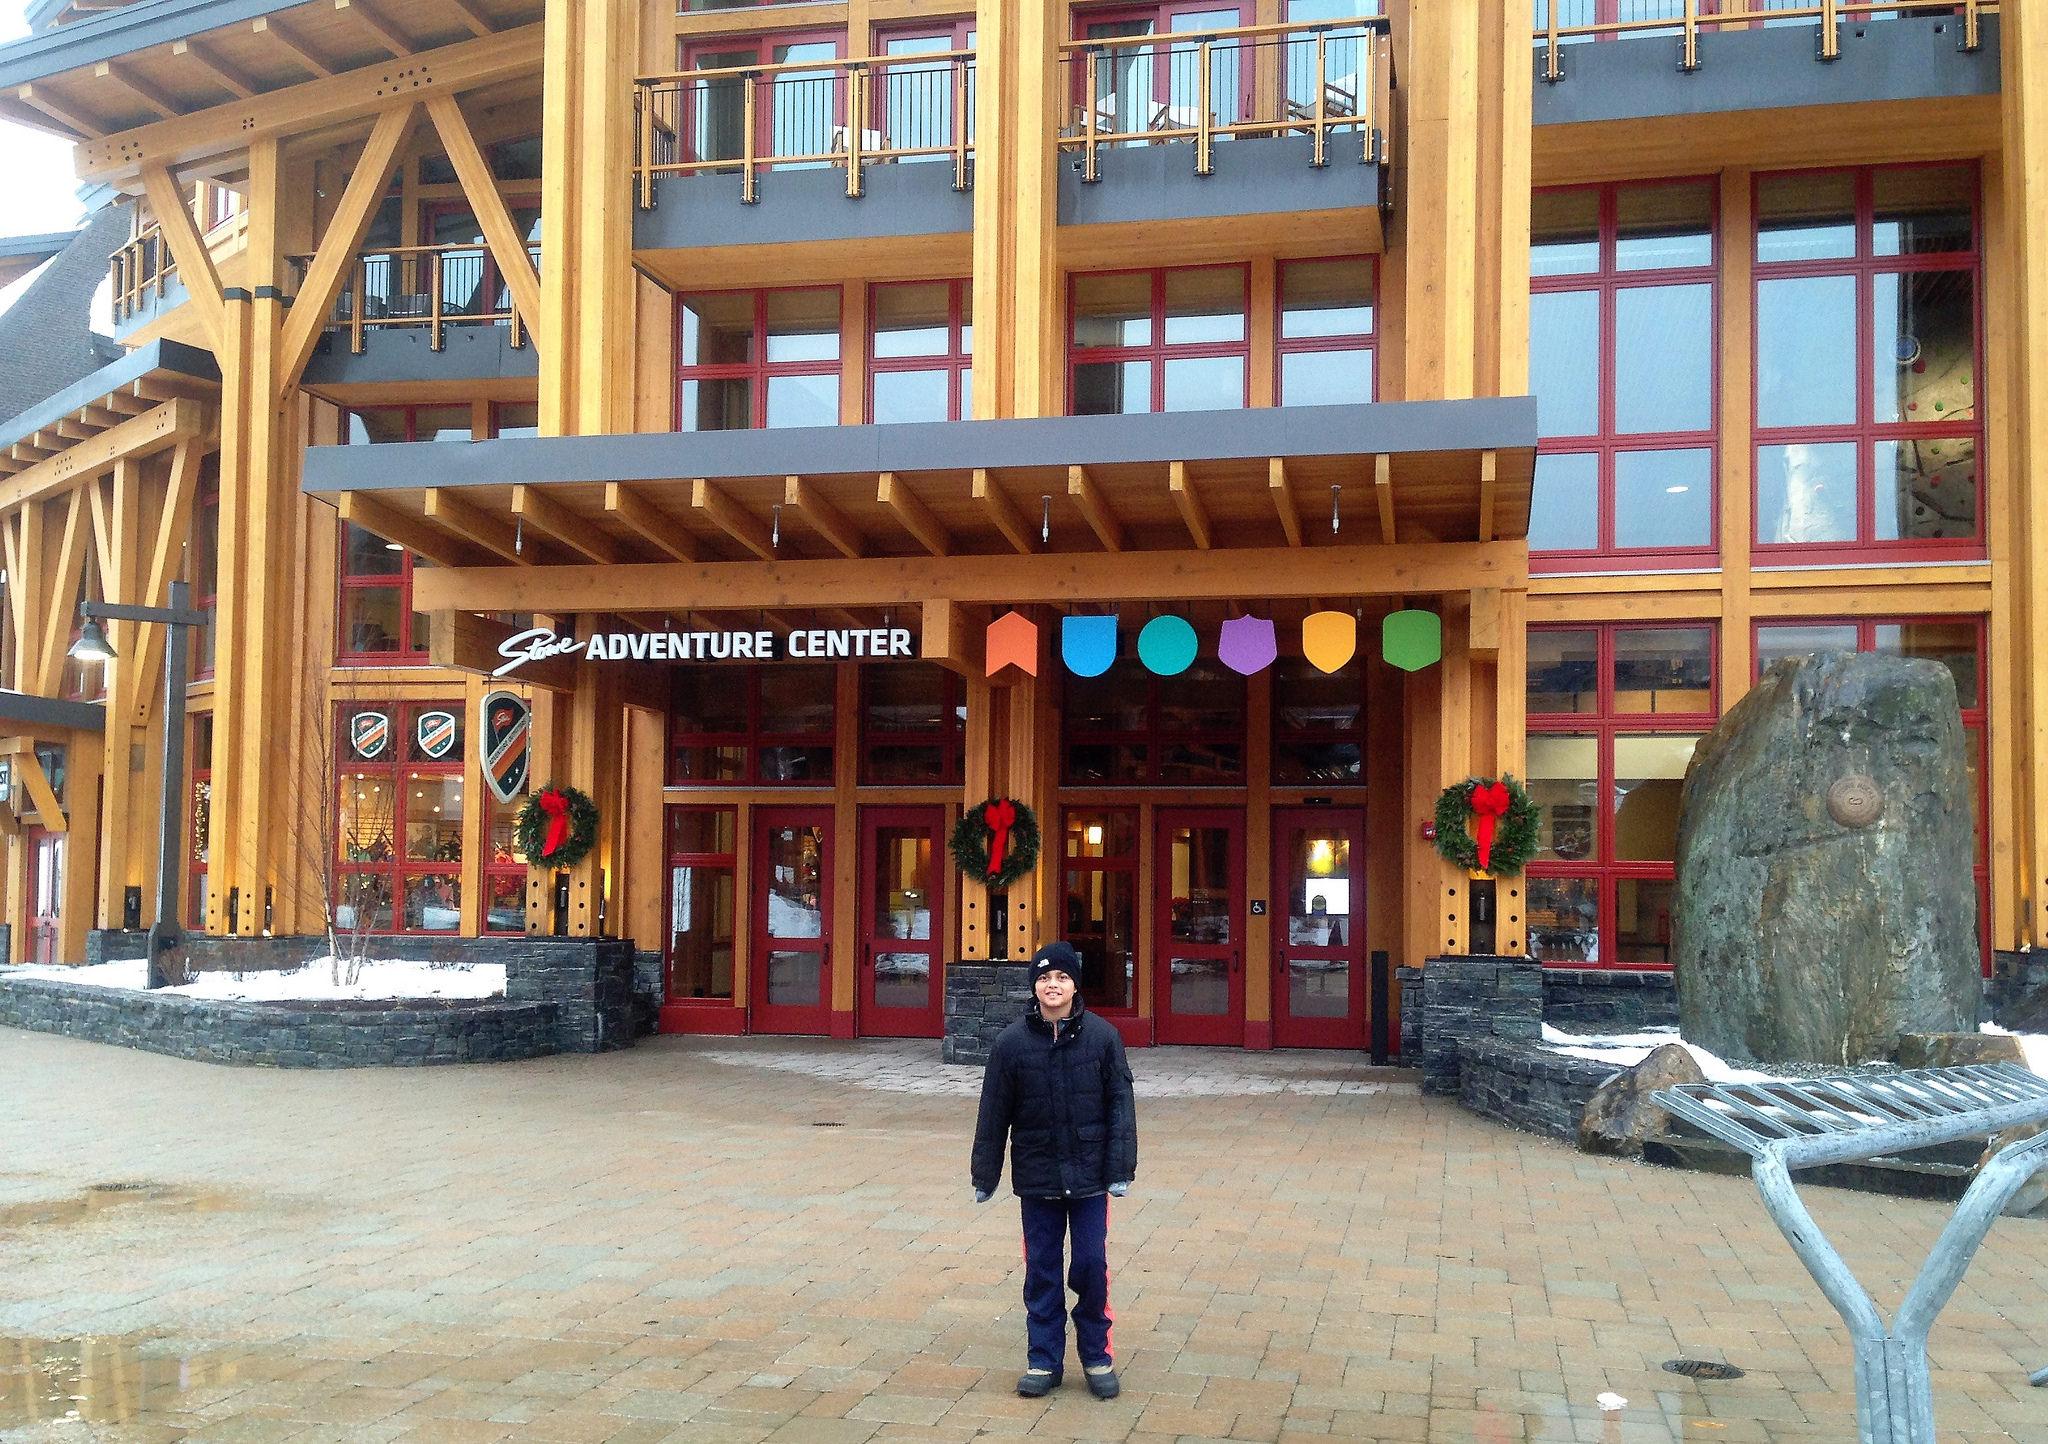 Adventure Center at Stowe Mountain Resort, Vermont